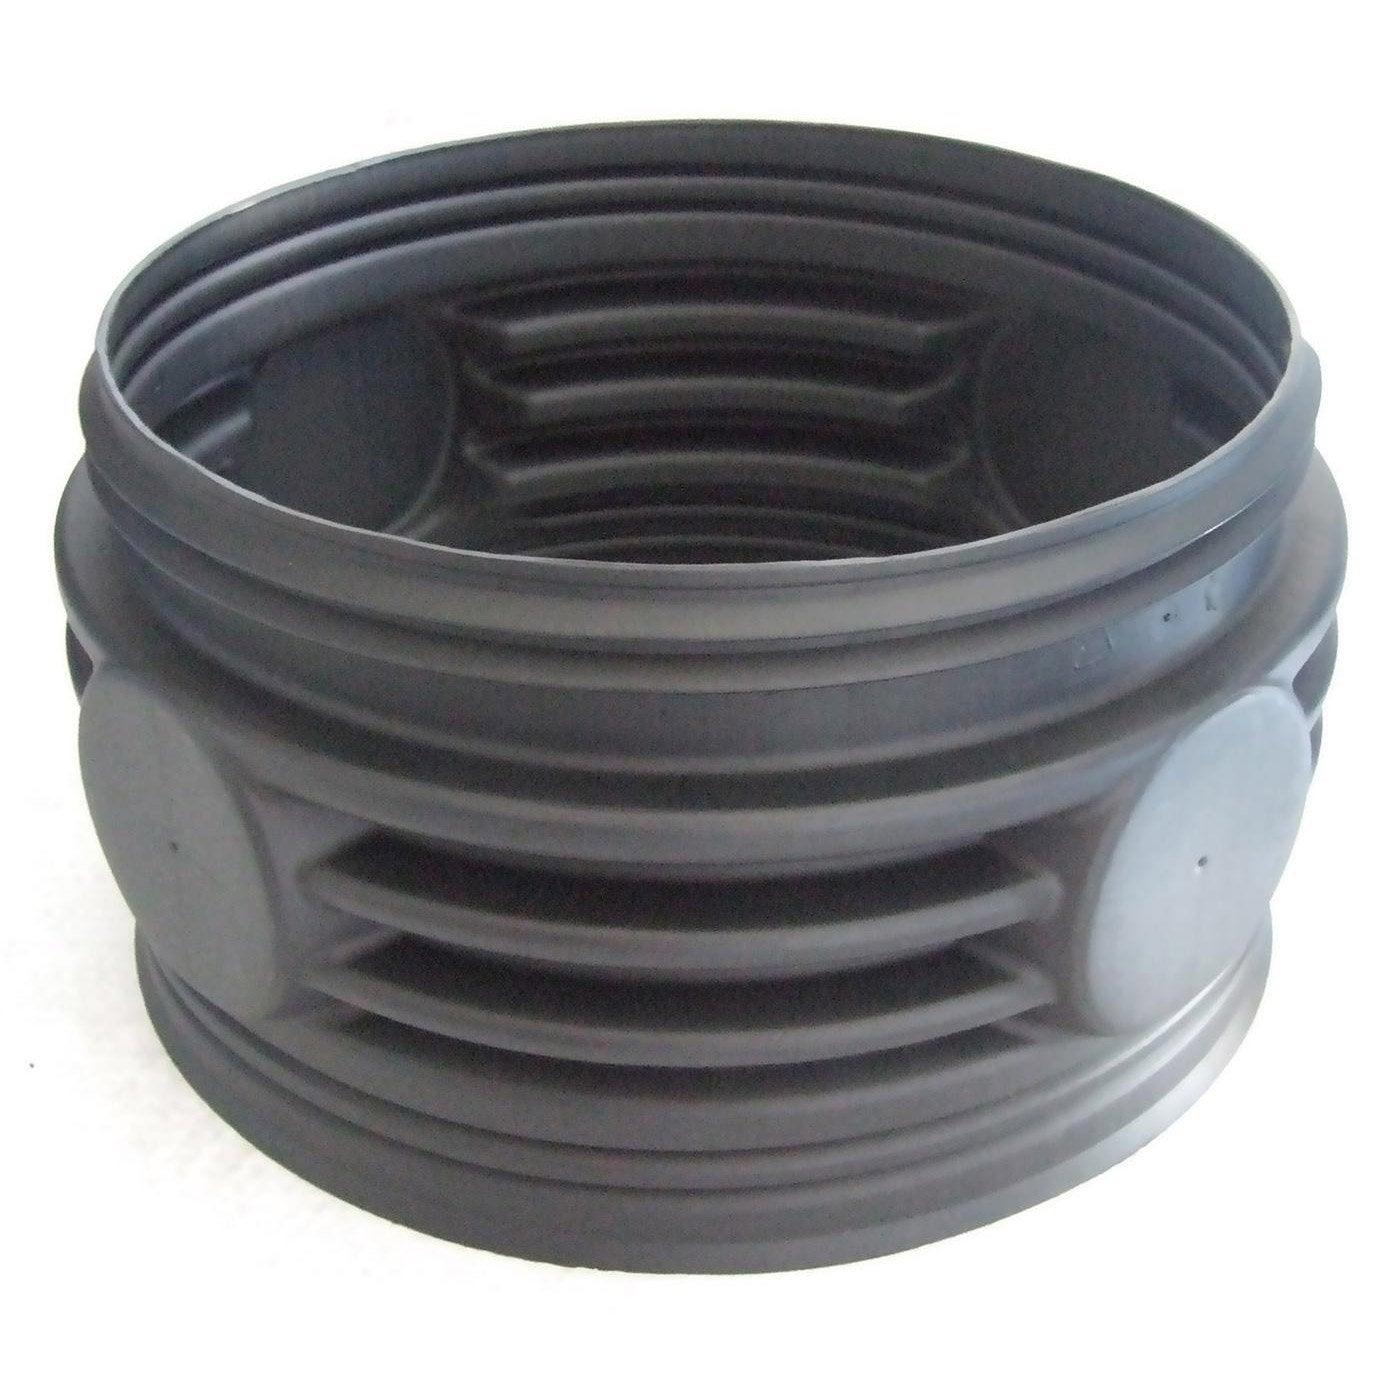 rehausse pour fosse septique poly thyl ne 40x40x20 cm leroy merlin. Black Bedroom Furniture Sets. Home Design Ideas